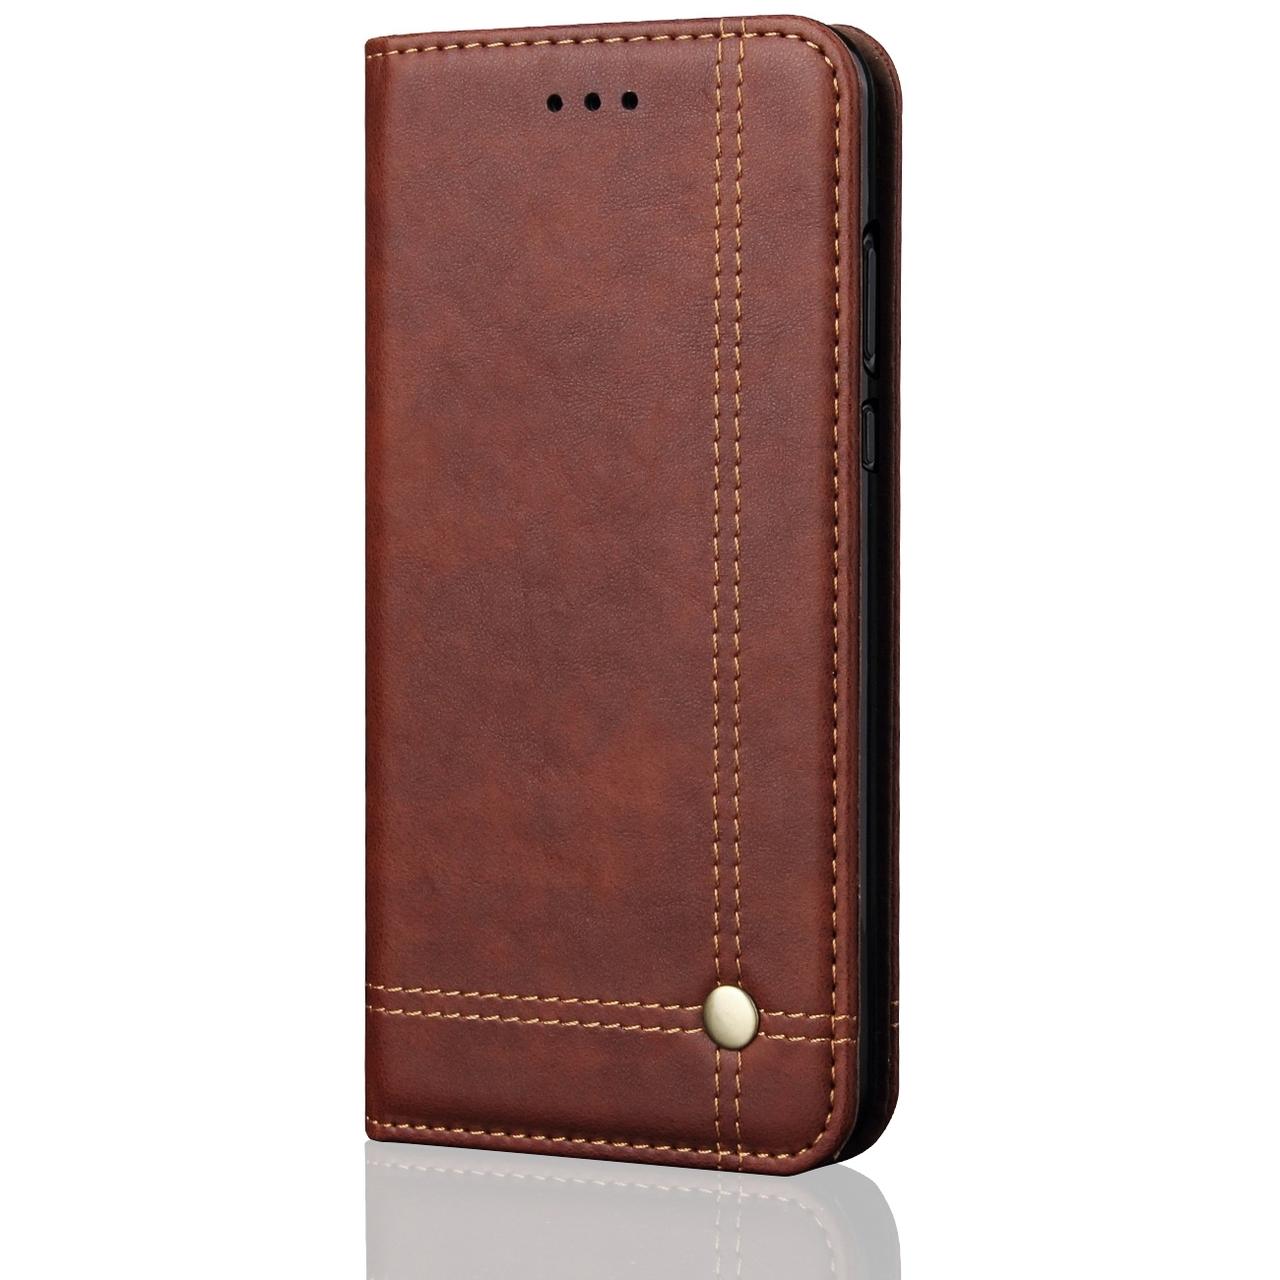 meet d8c78 ece47 OnePlus 6T Retro Leather Case Card Holder Brown